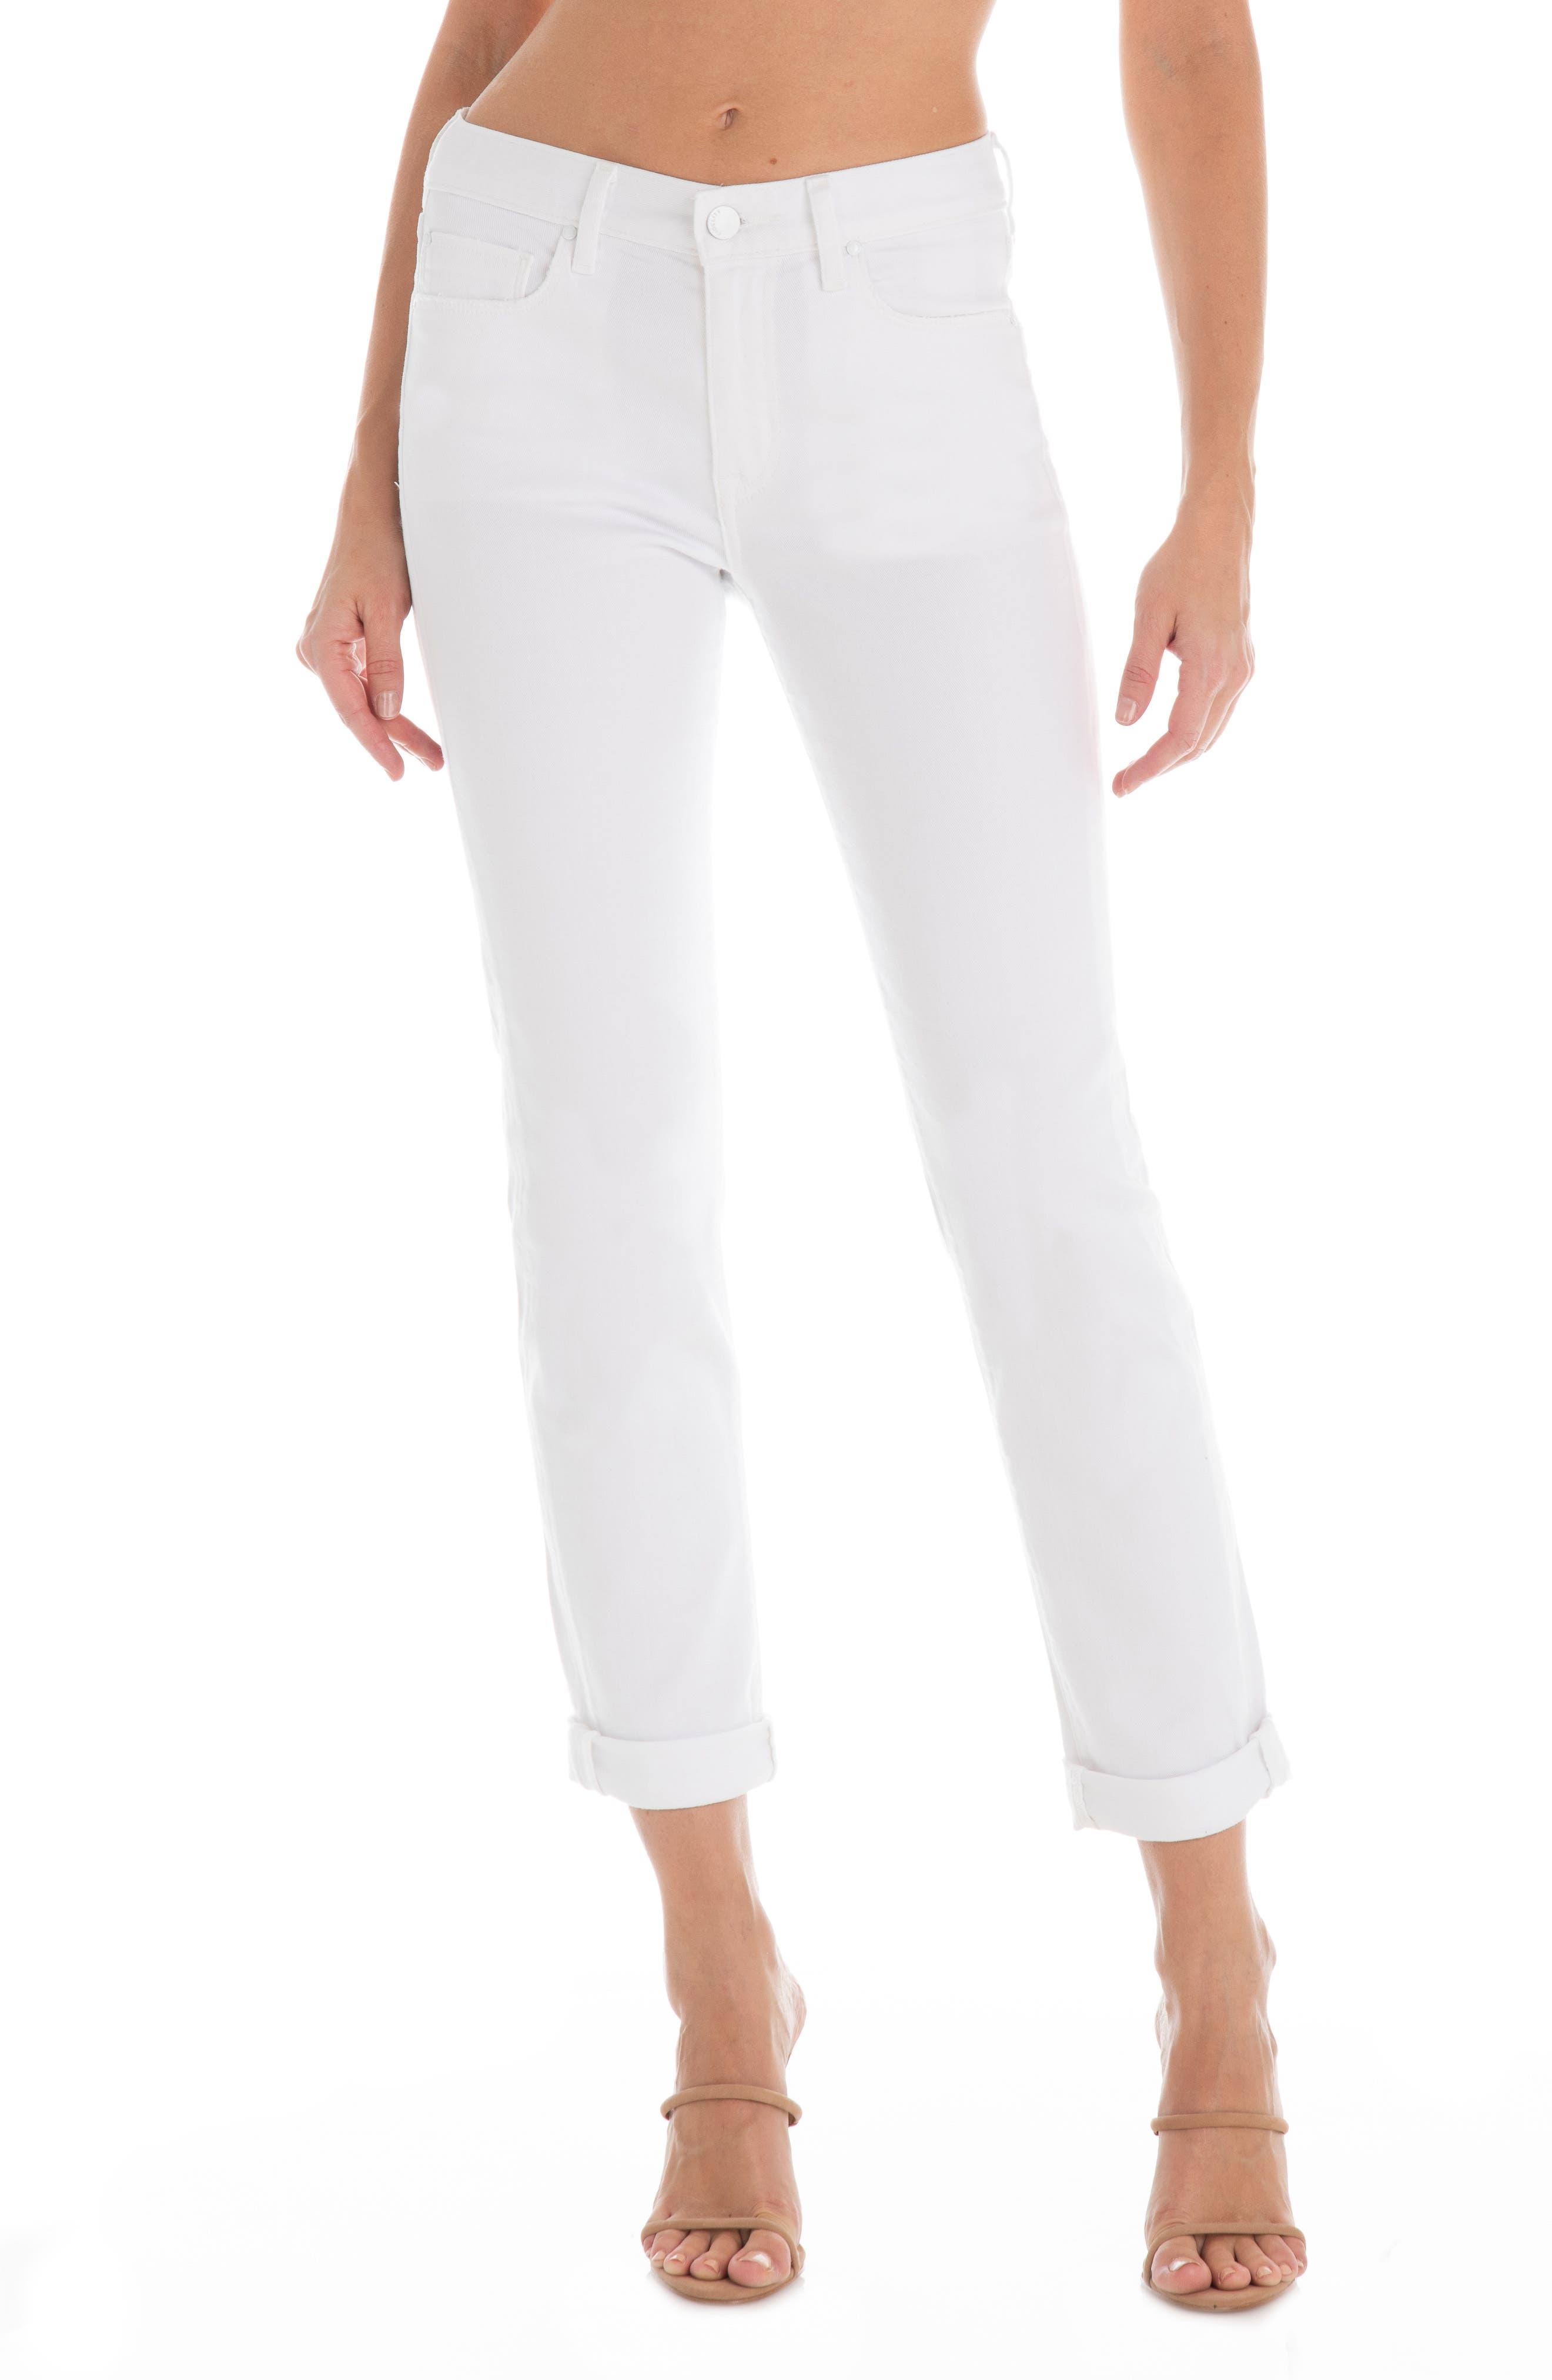 Image of FIDELITY DENIM Oh Boy Boyfriend Fit Jeans